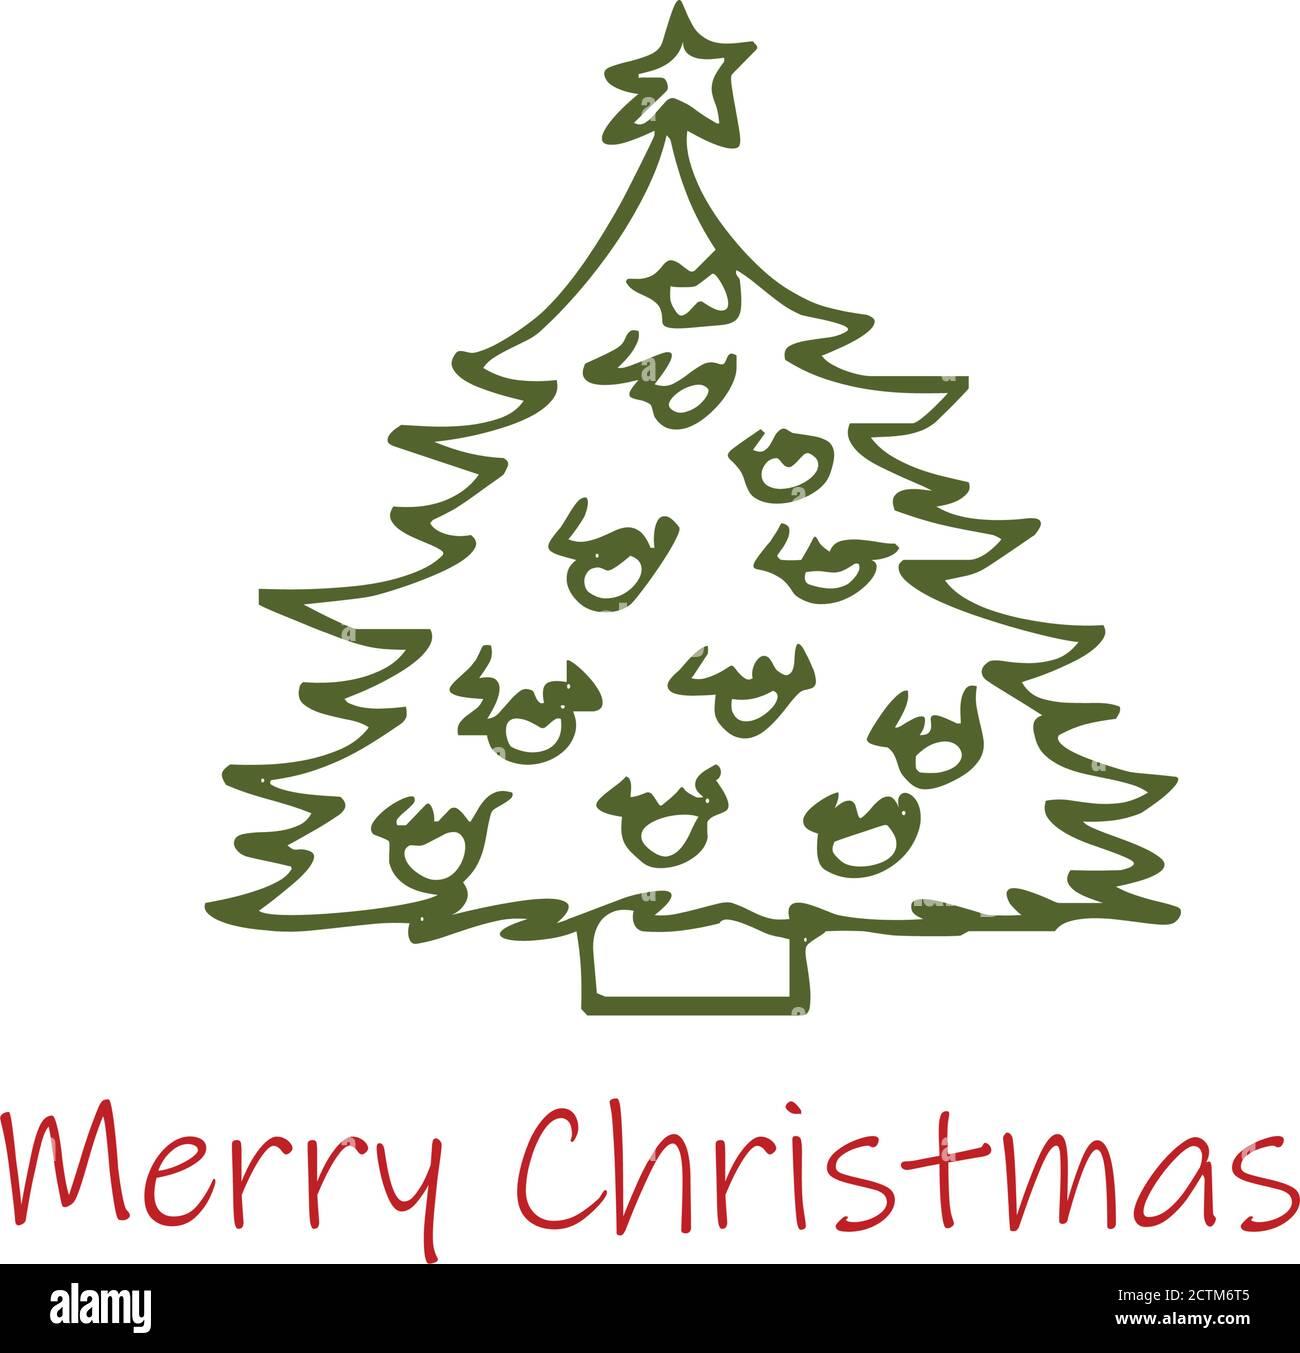 Diseño De Plantilla De árbol De Navidad Para Imprimir O Usar Como Póster Tarjeta Volante O Camiseta Imagen Vector De Stock Alamy